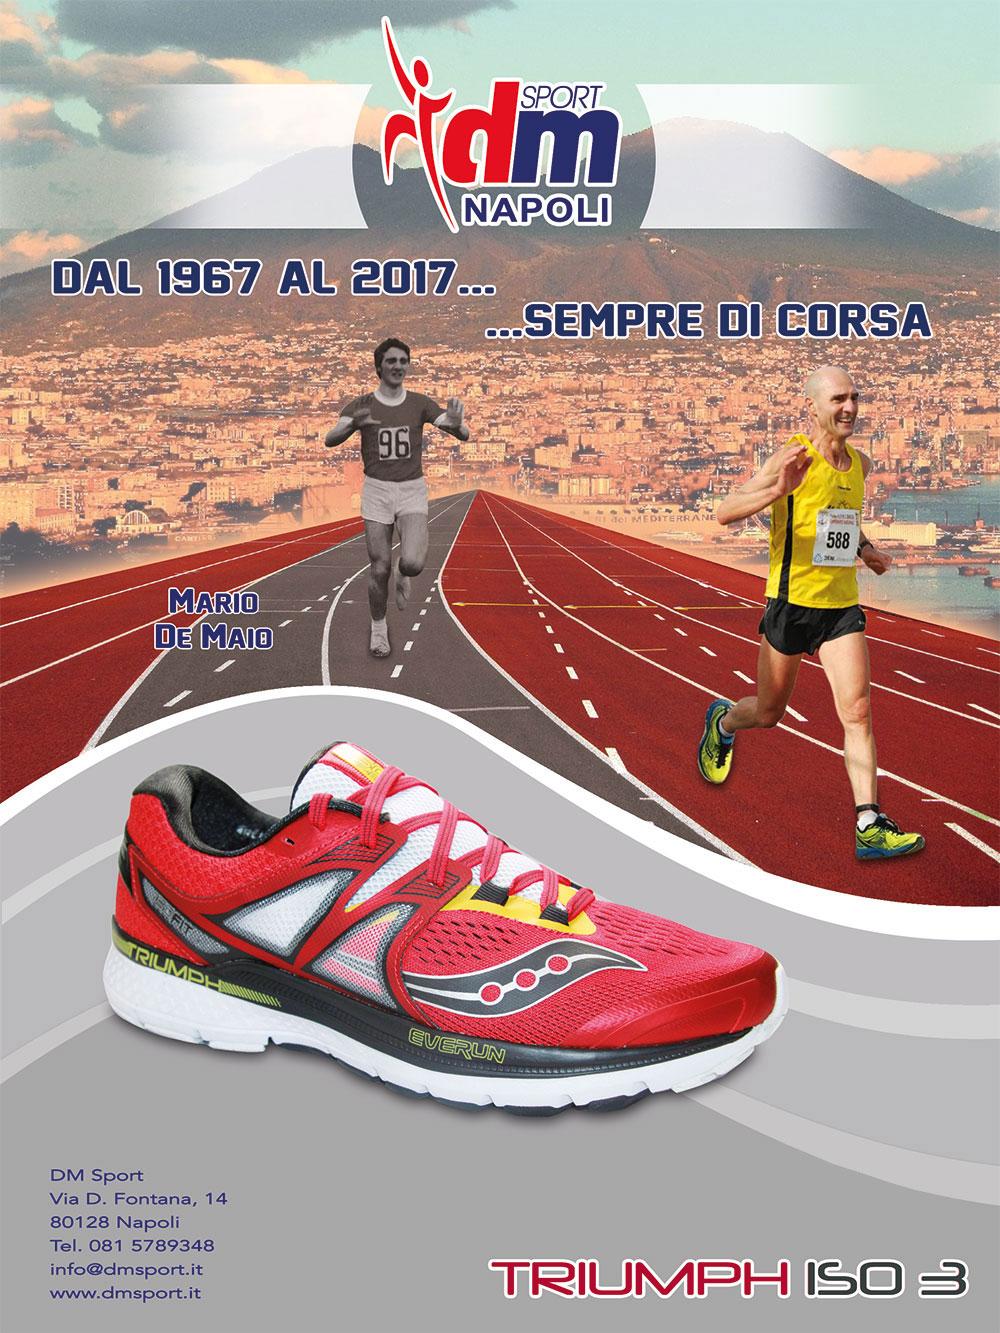 081 Vomero Scarpe Sport Sportive Dm 5789348 Napoli tEEHq1